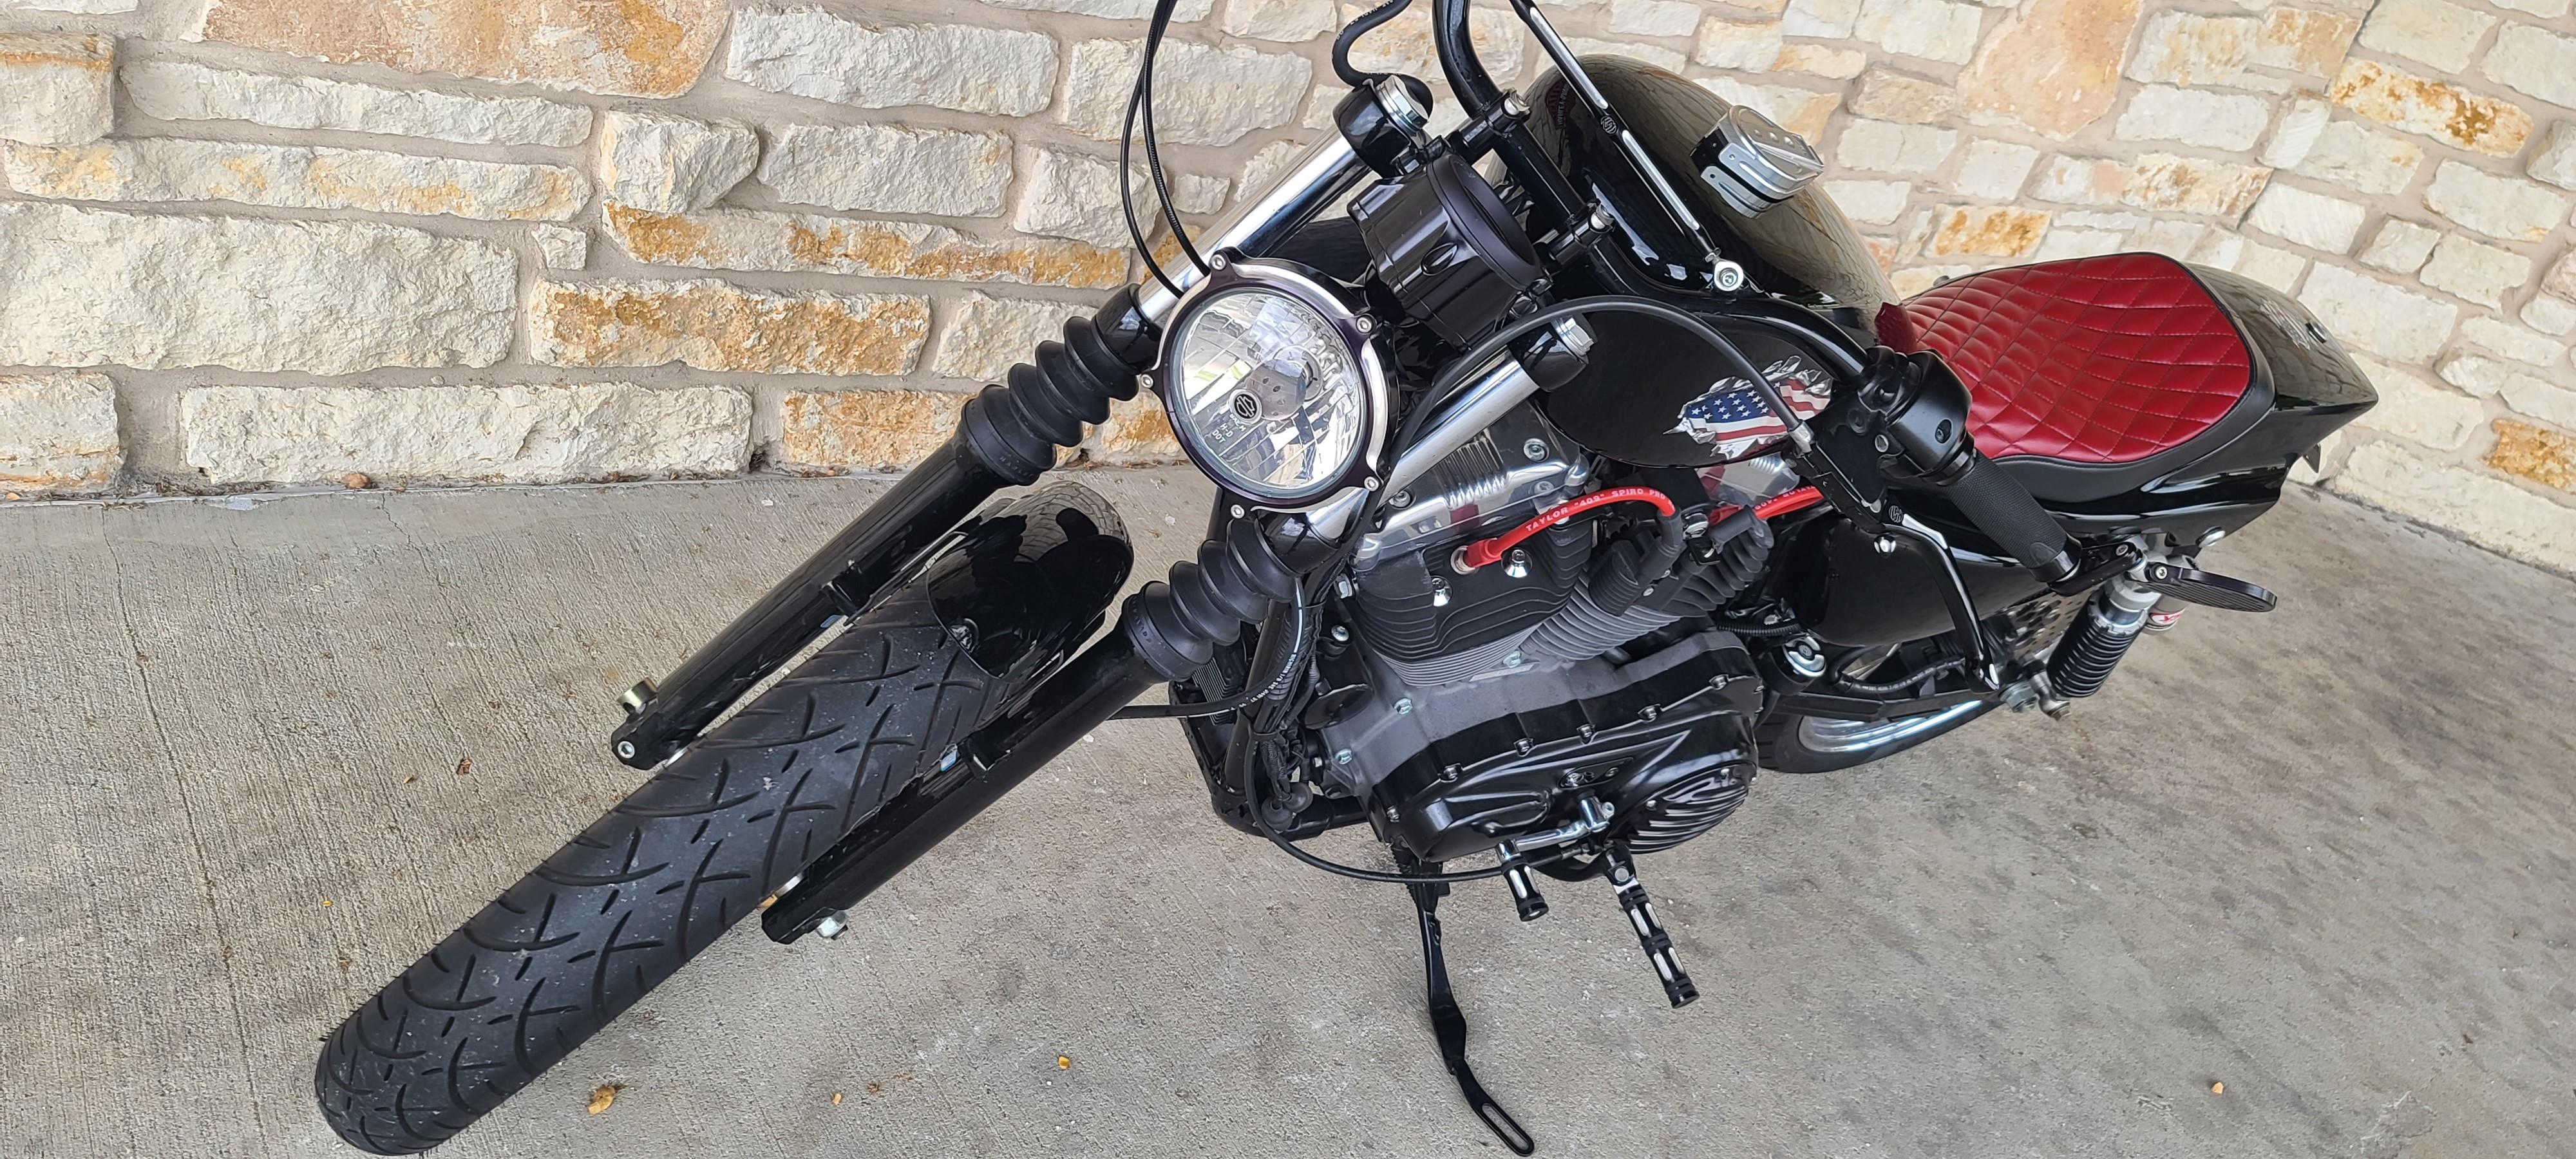 2008 Harley-Davidson Sportster 1200 Nightster at Harley-Davidson of Waco